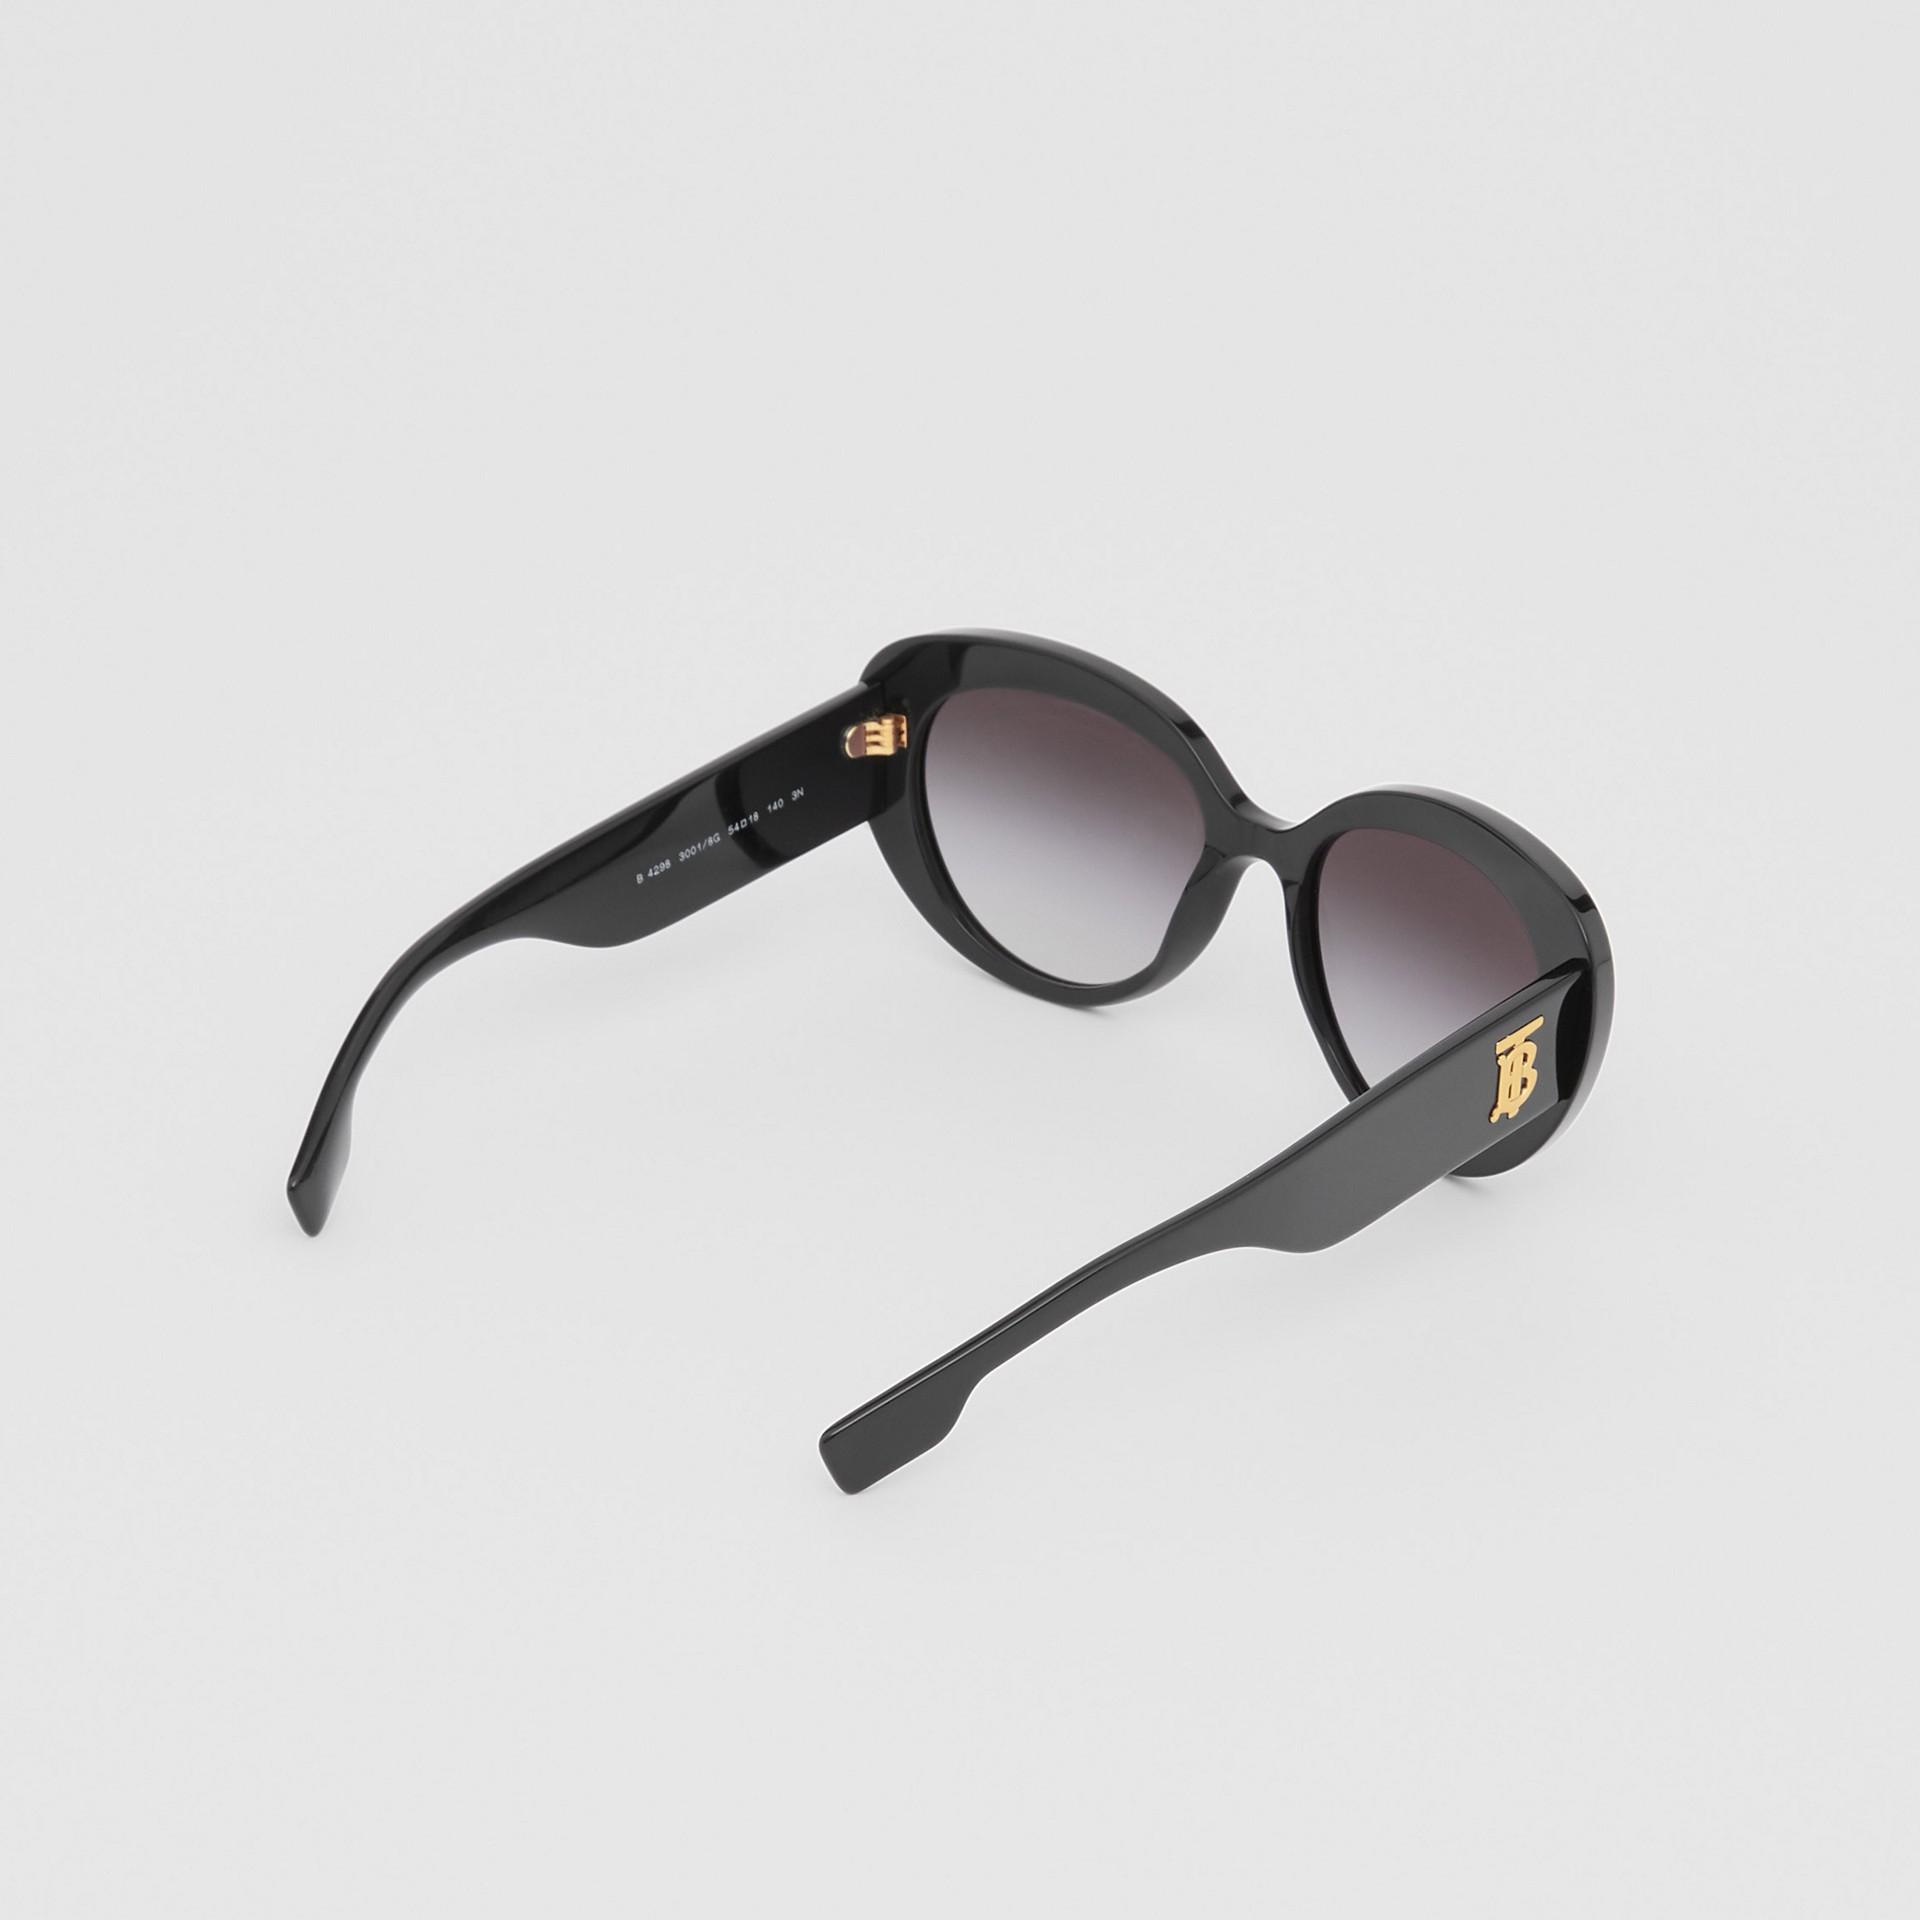 Monogram Motif Cat-eye Frame Sunglasses in Black - Women | Burberry United Kingdom - gallery image 4